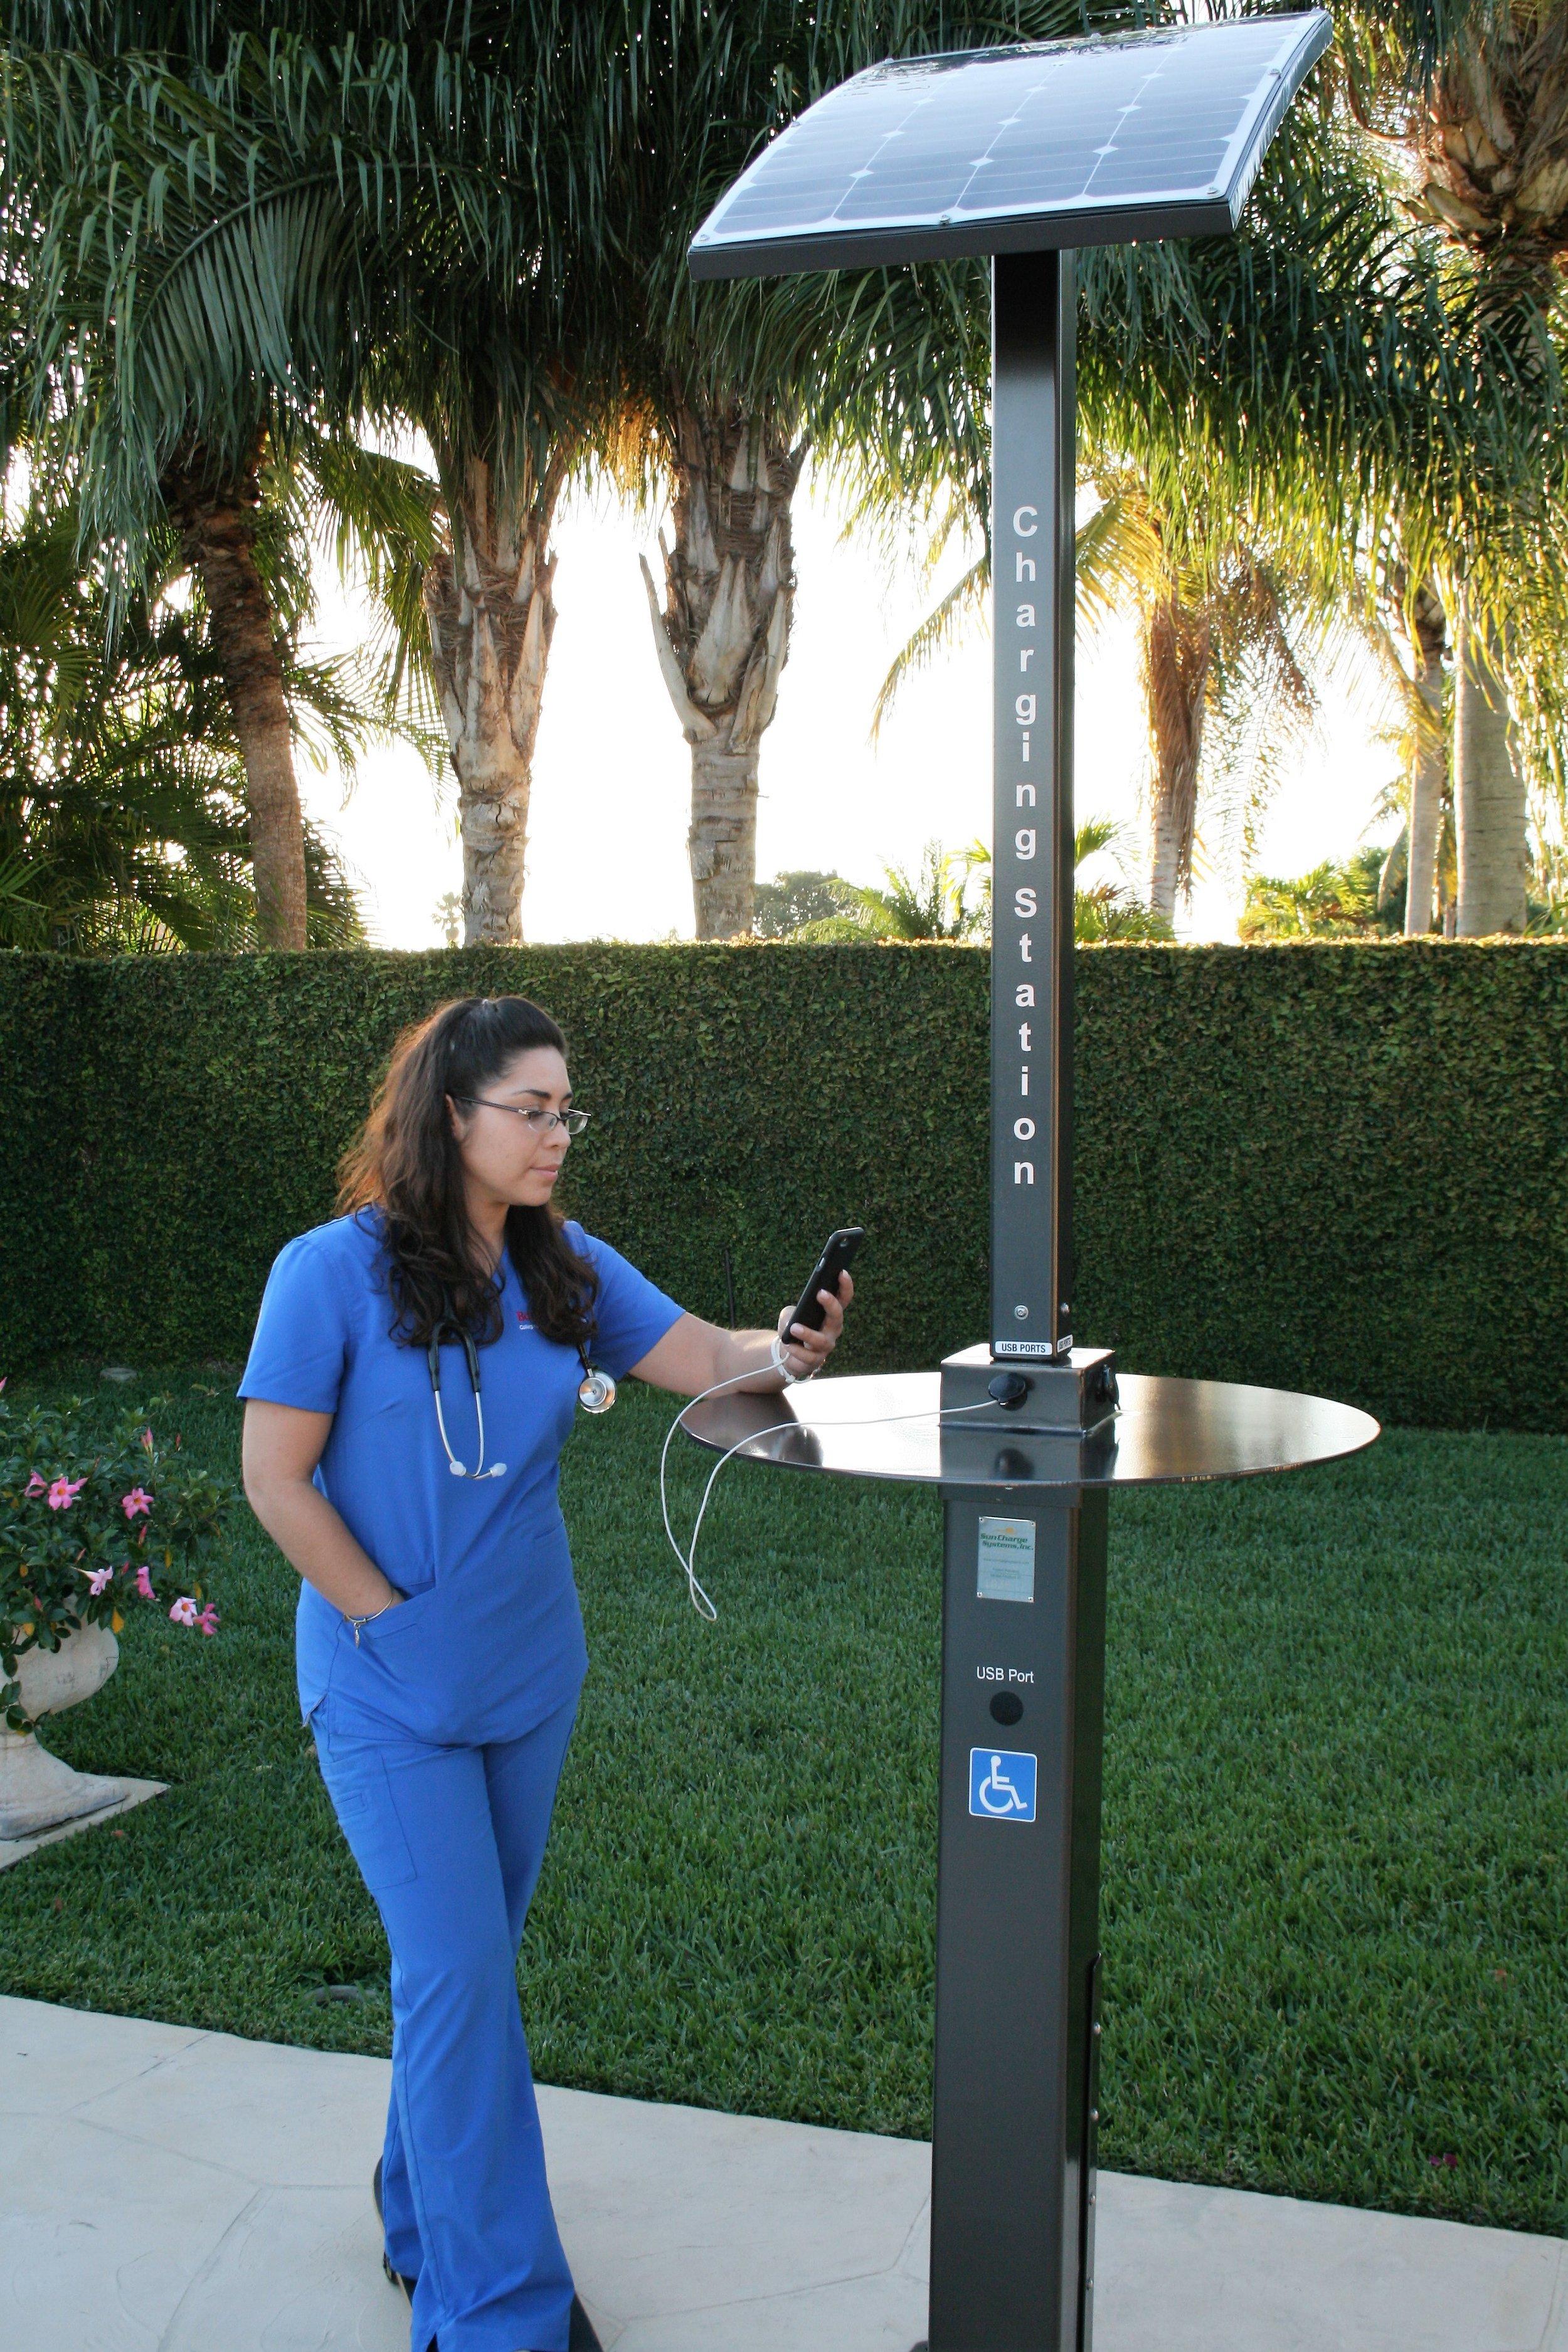 Solar Charging pole